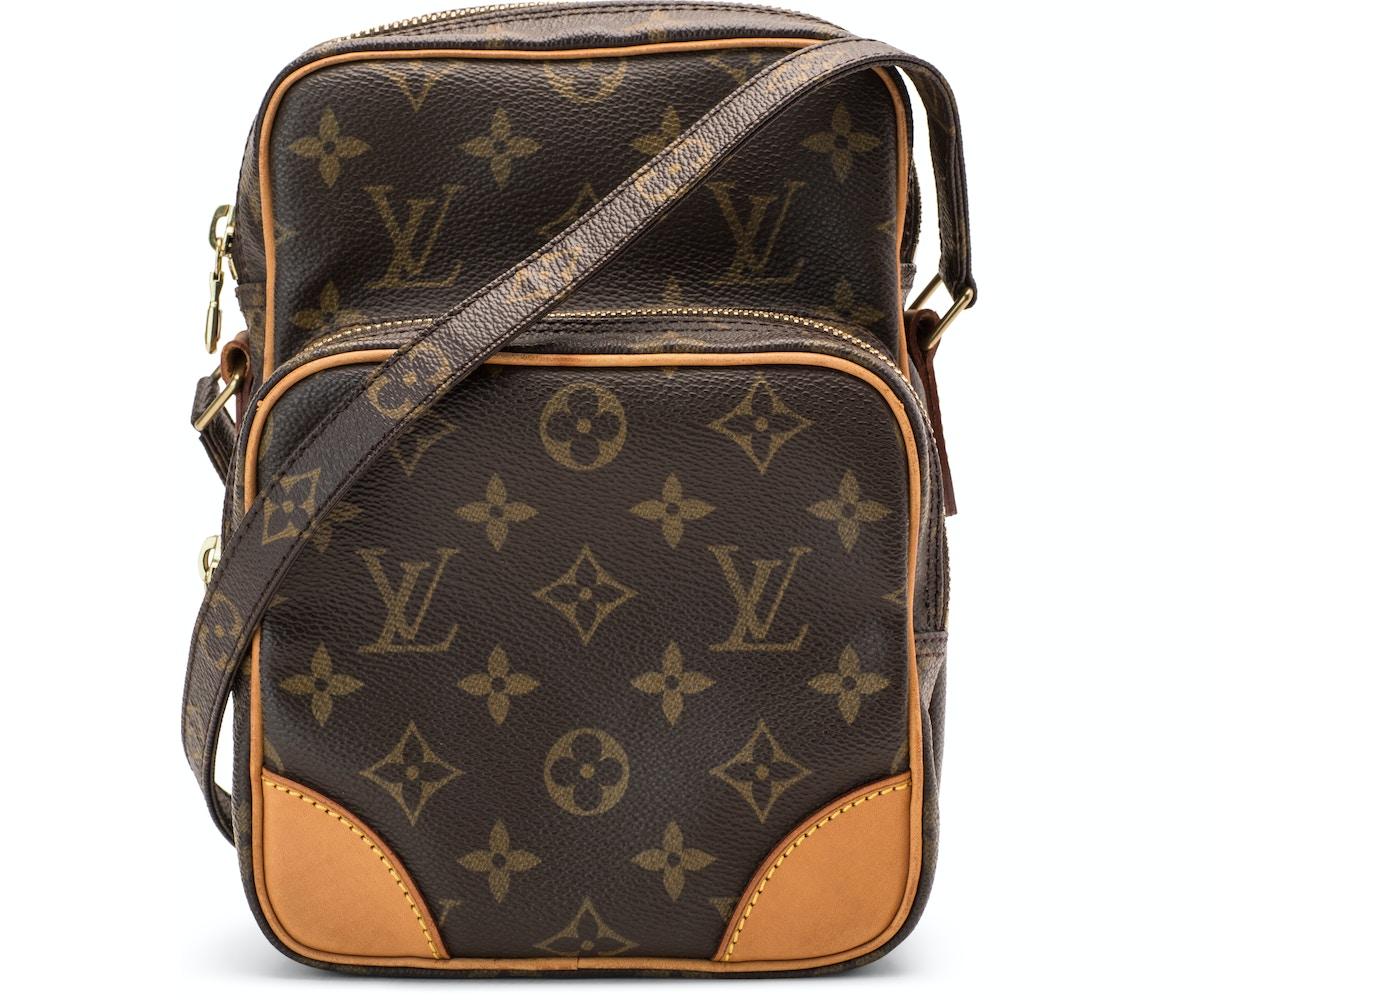 9ec6c85e4 Louis Vuitton Amazone Monogram Canvas Brown. Monogram Canvas Brown